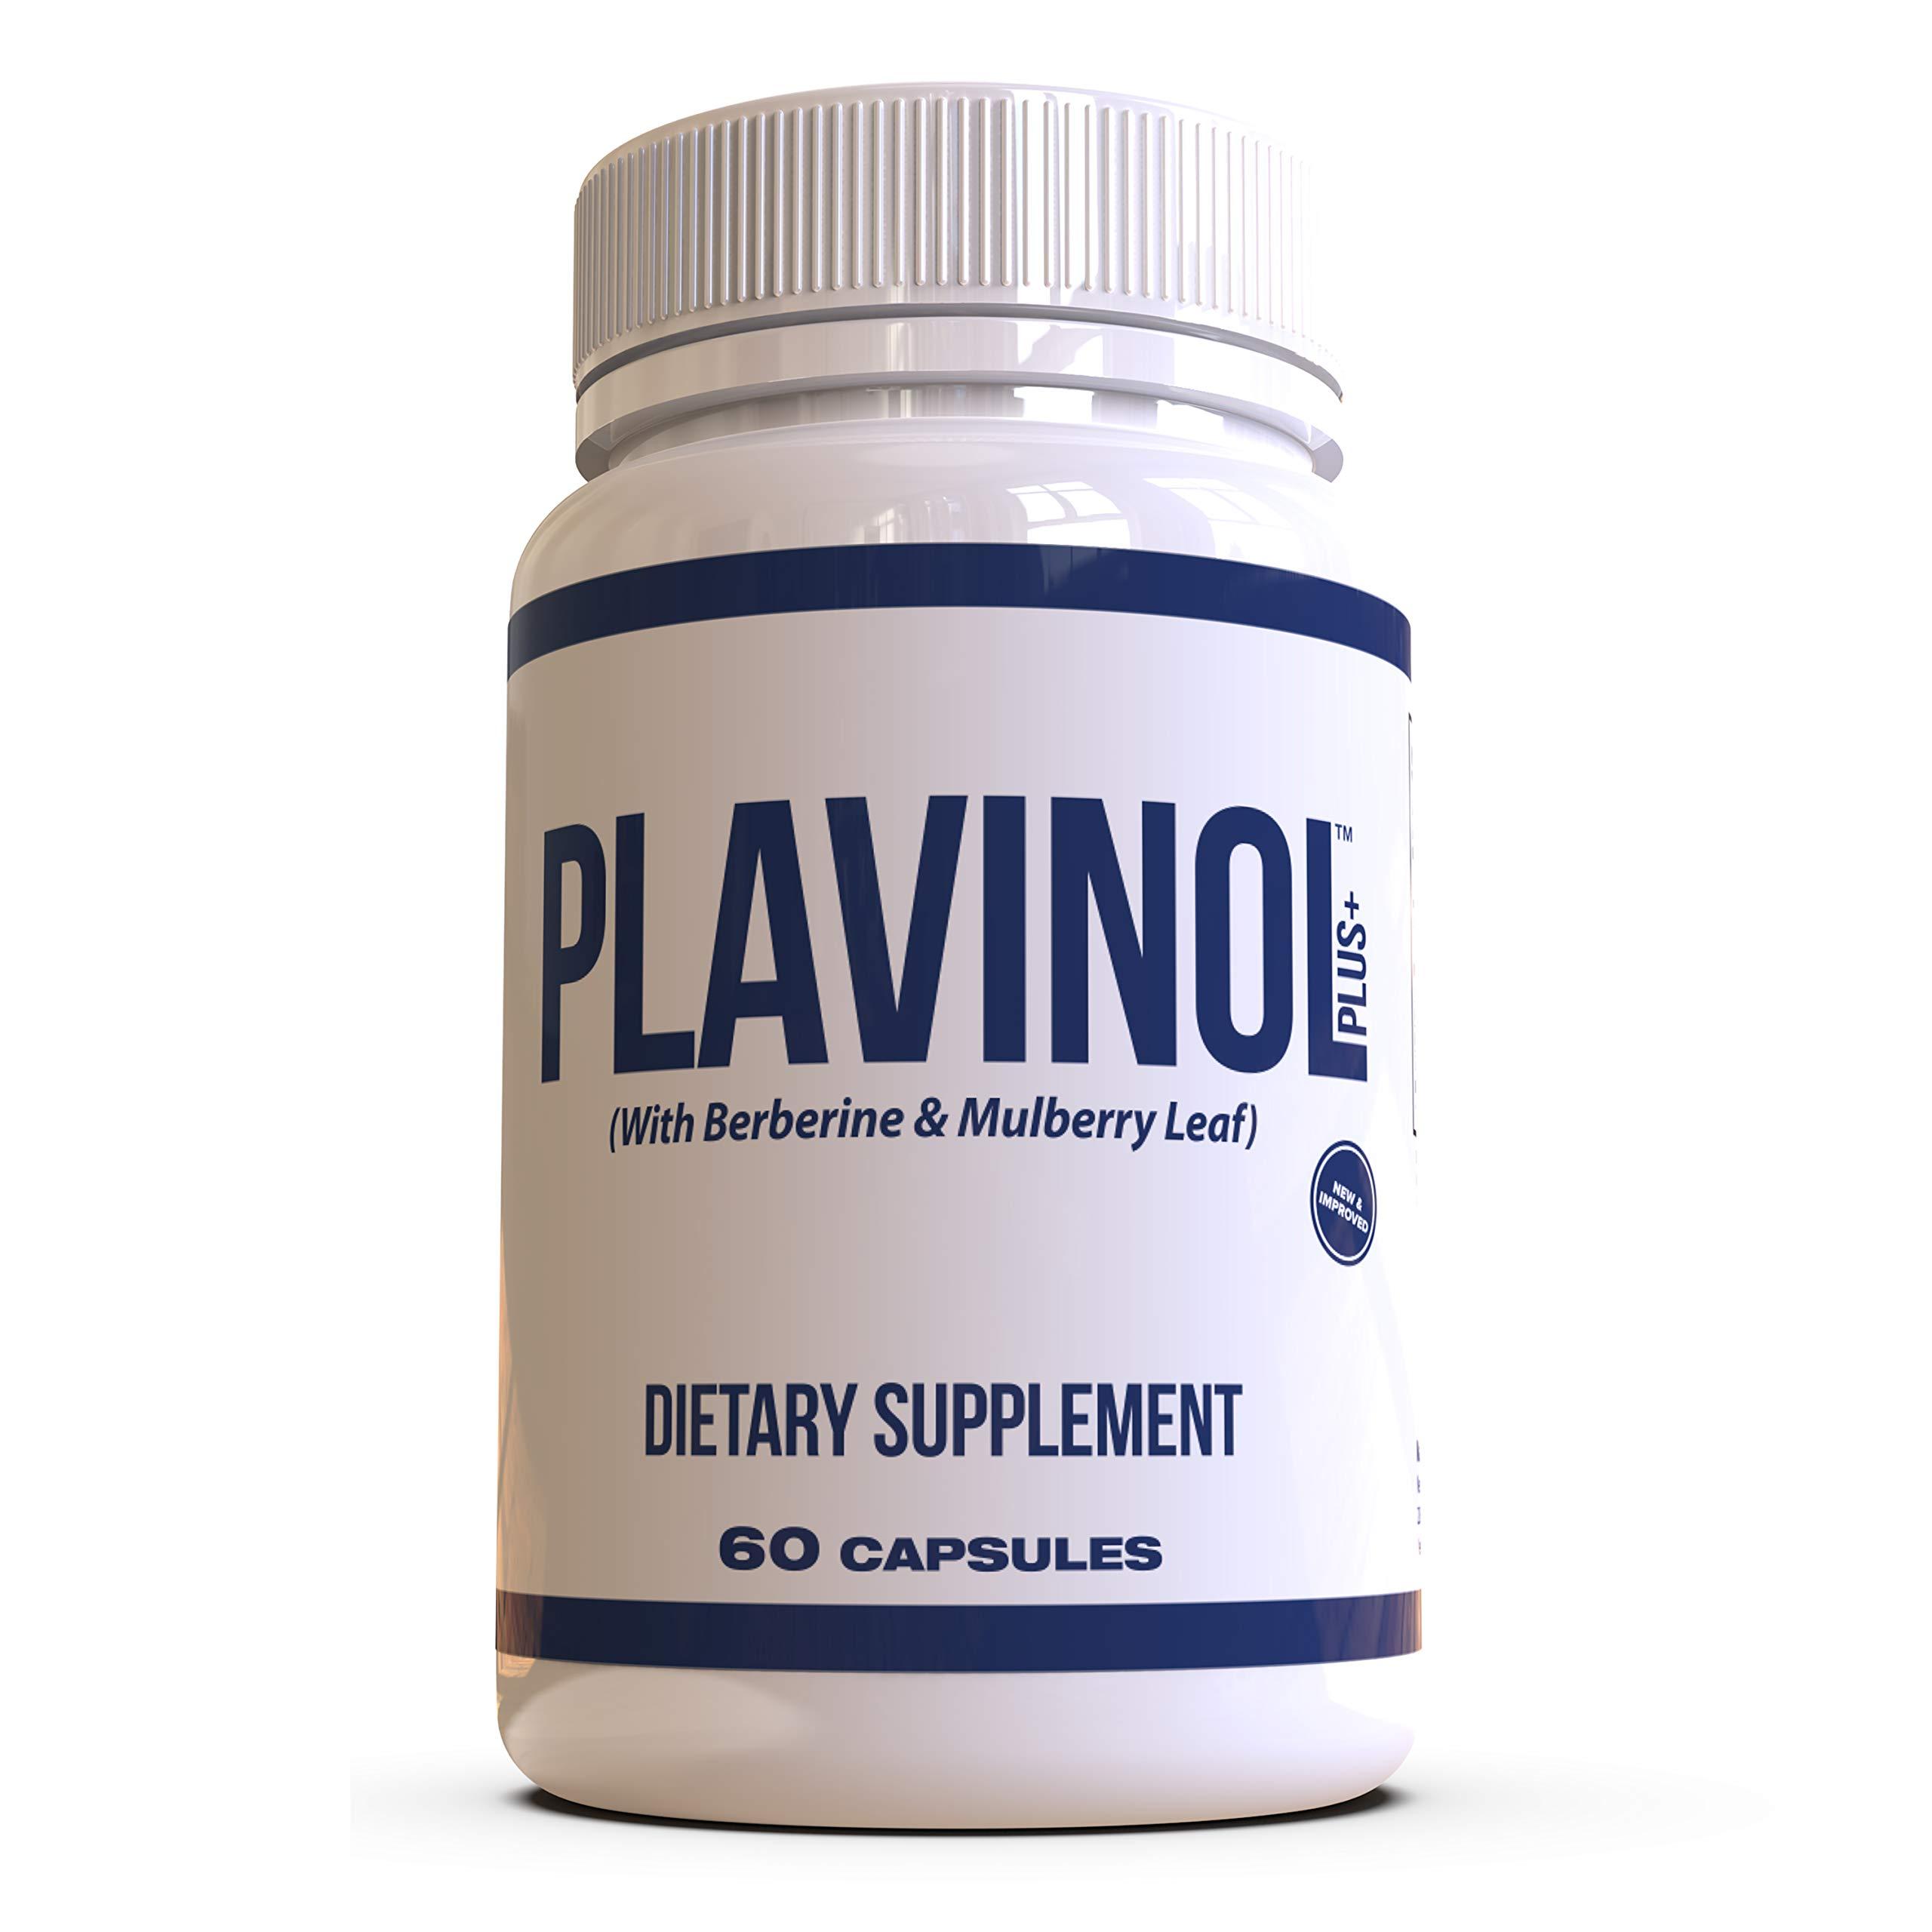 Nexus Formulas - PLAVINOL - Blood Sugar and Cholesterol Control Supplement